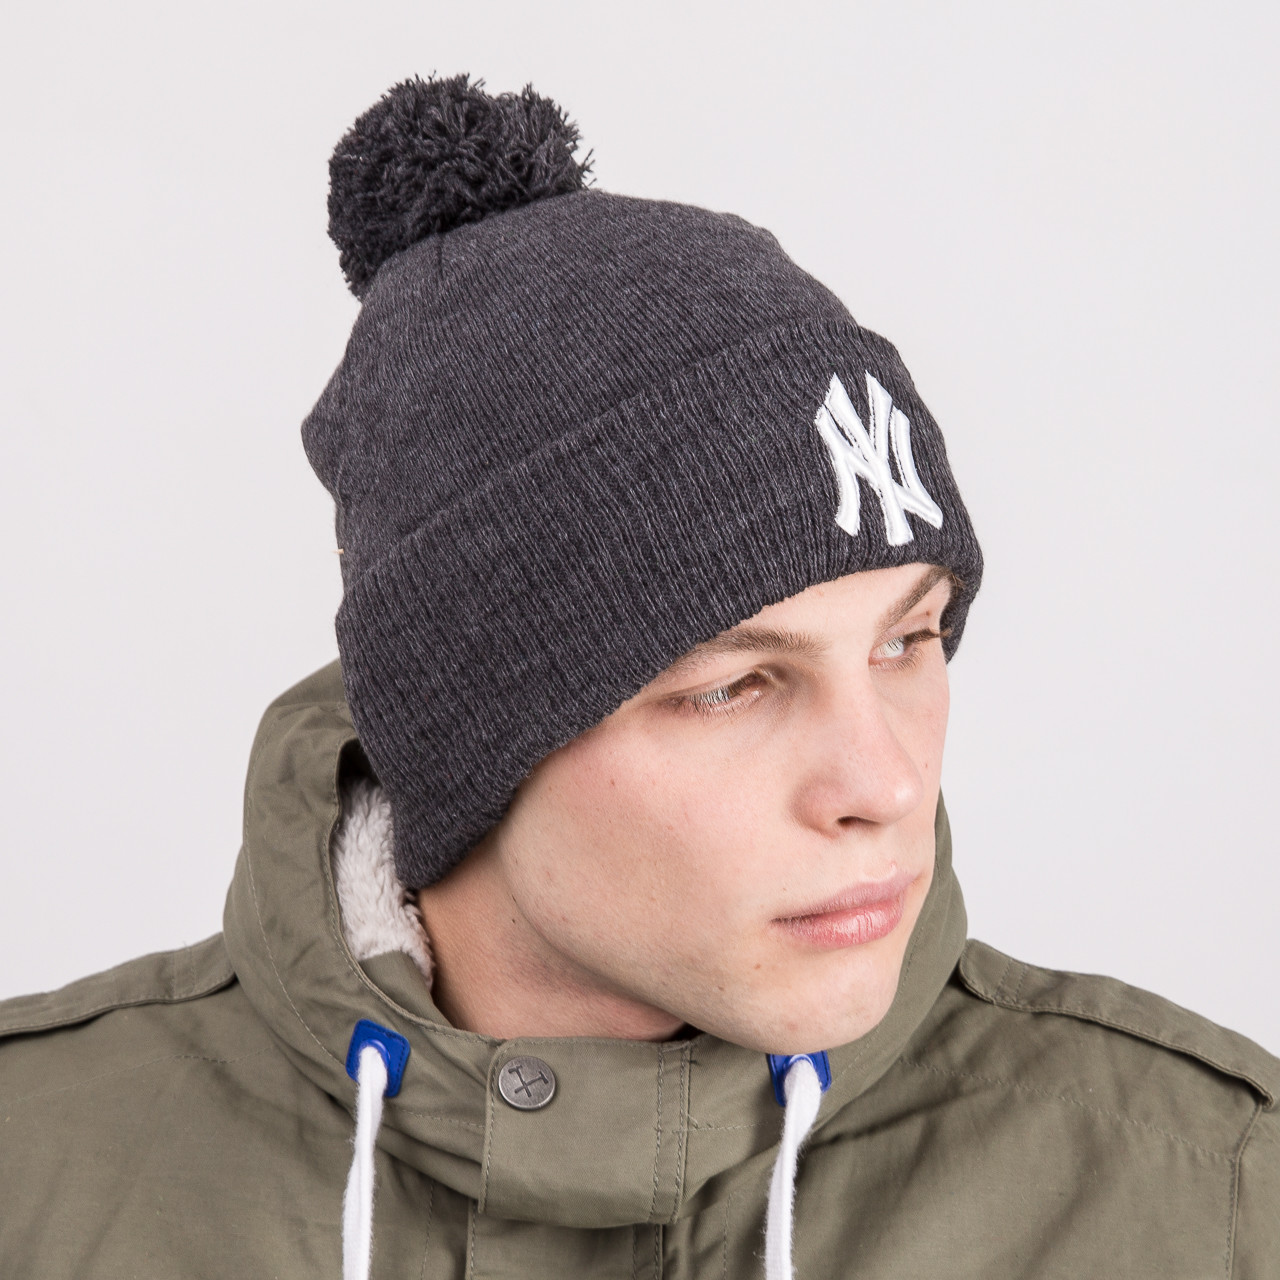 Стильная спортивная мужская шапка с помпоном - New York (NY) - Артикул 8819